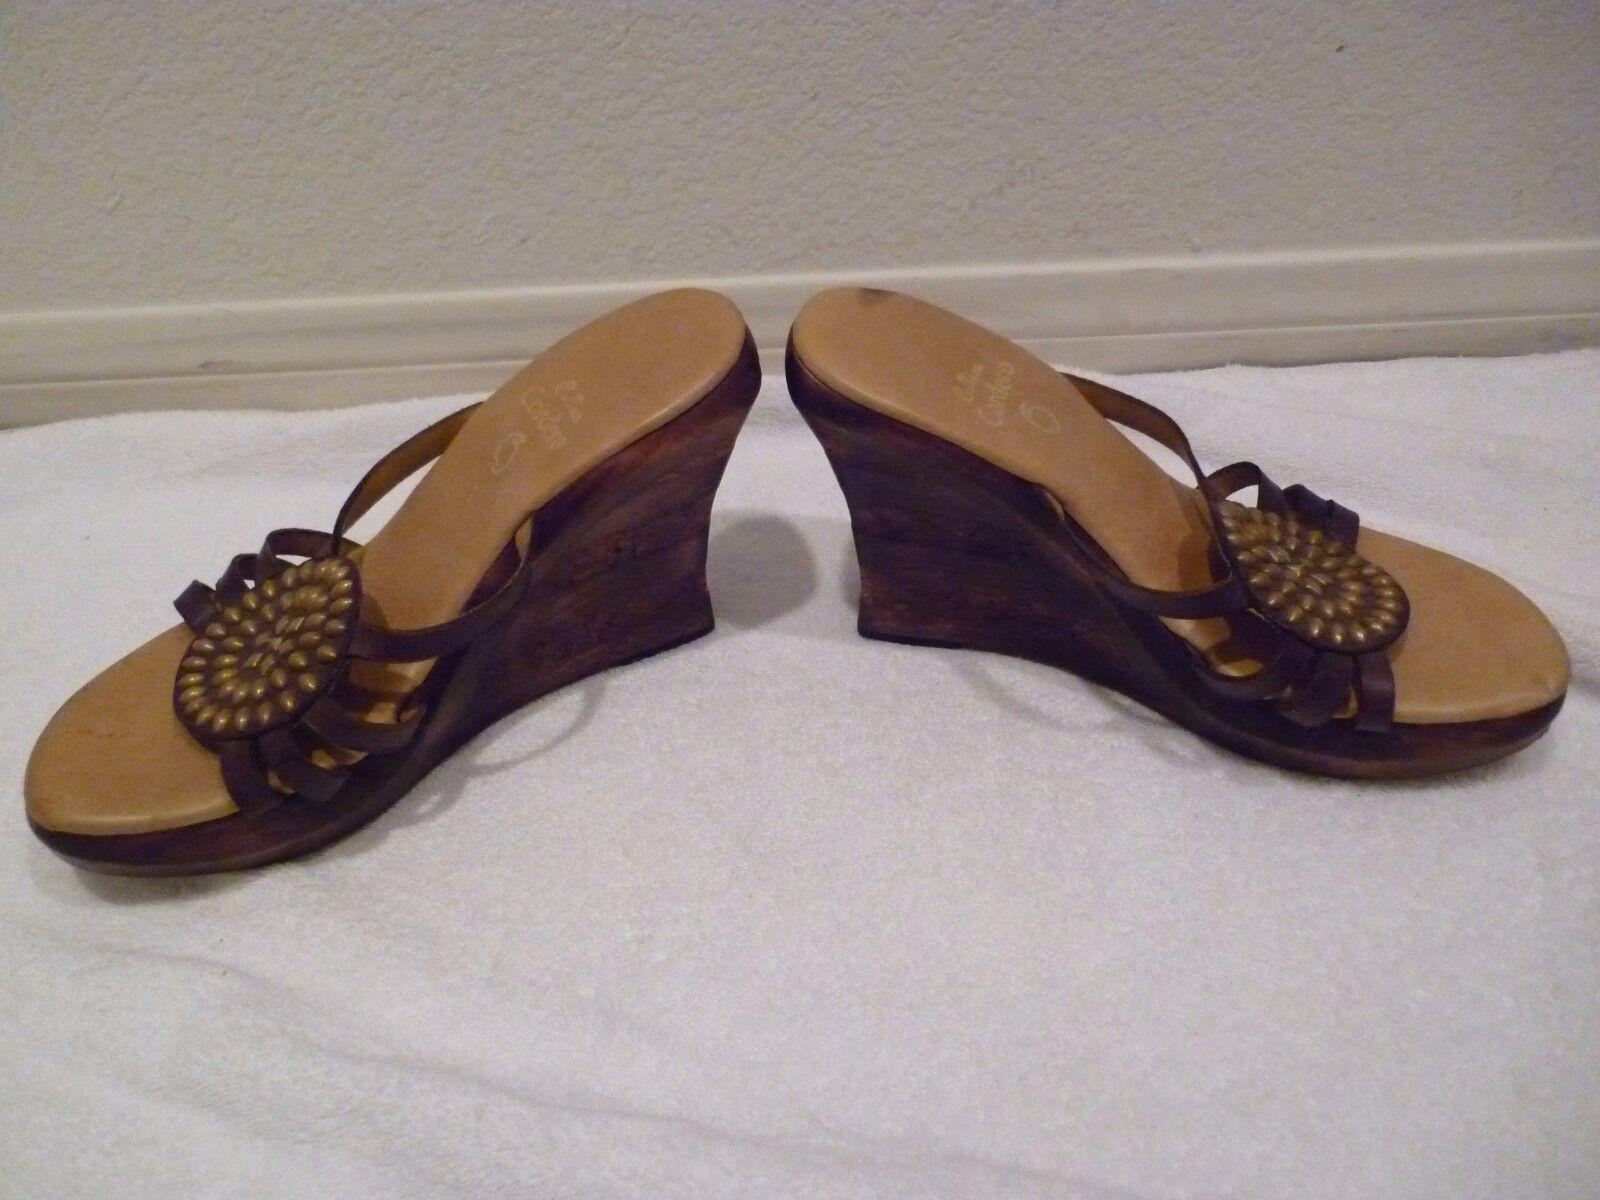 Calleen Cordero Handmade Distressed Metallic Leather chaussures chaussures chaussures wedges stud SZ 40 10 5ff432